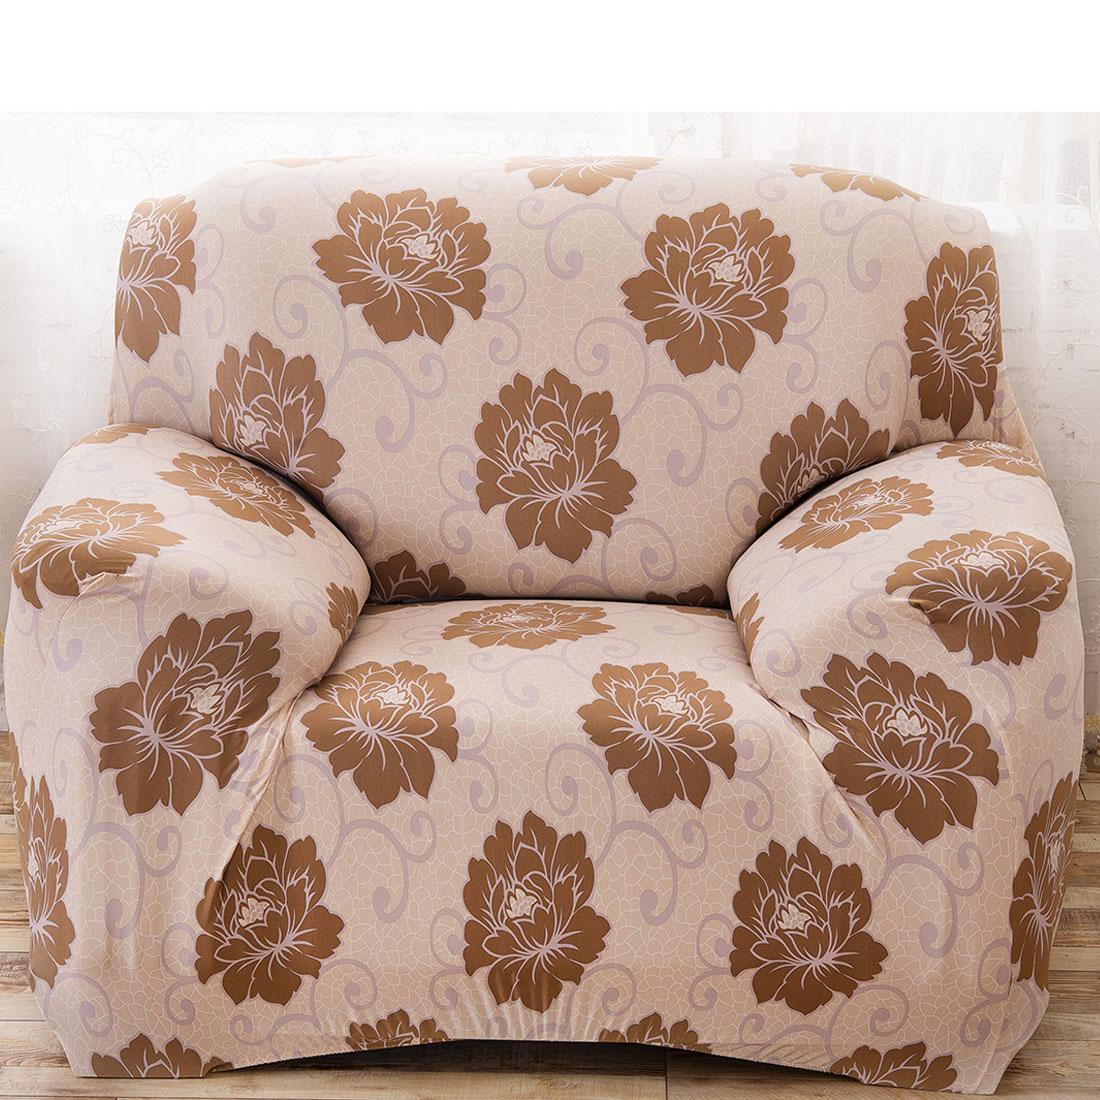 Online Get Cheap Sofa Chair Cover Aliexpresscom Alibaba Group - Cheap sofa and chair